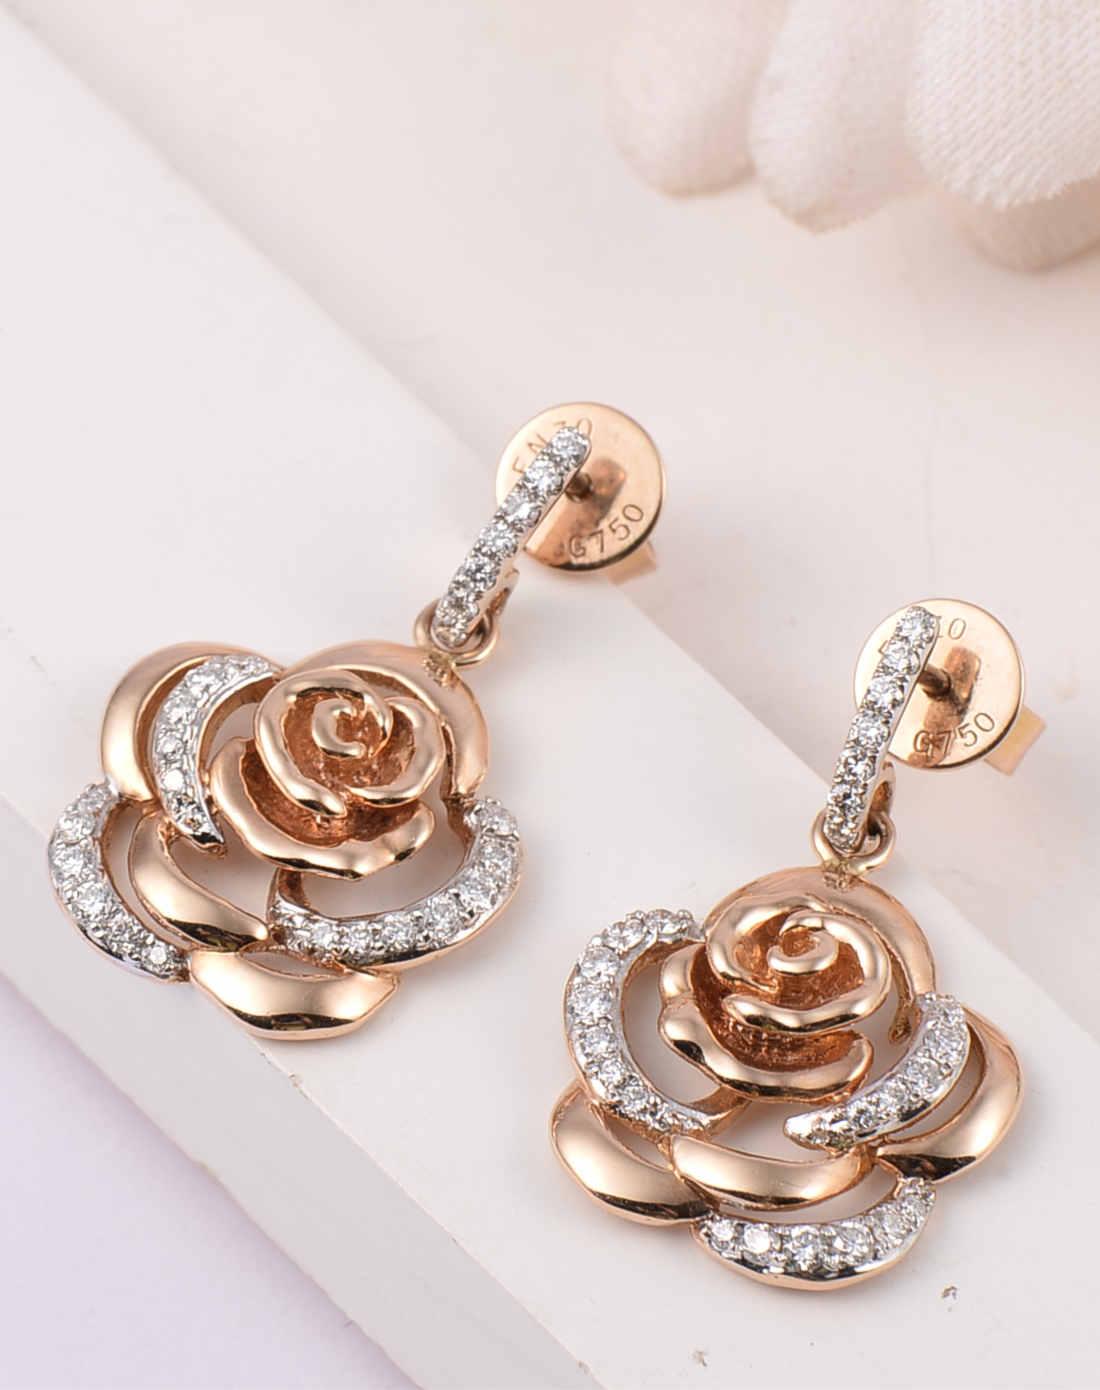 enzo珠宝专场-18k金玫瑰花钻石耳环